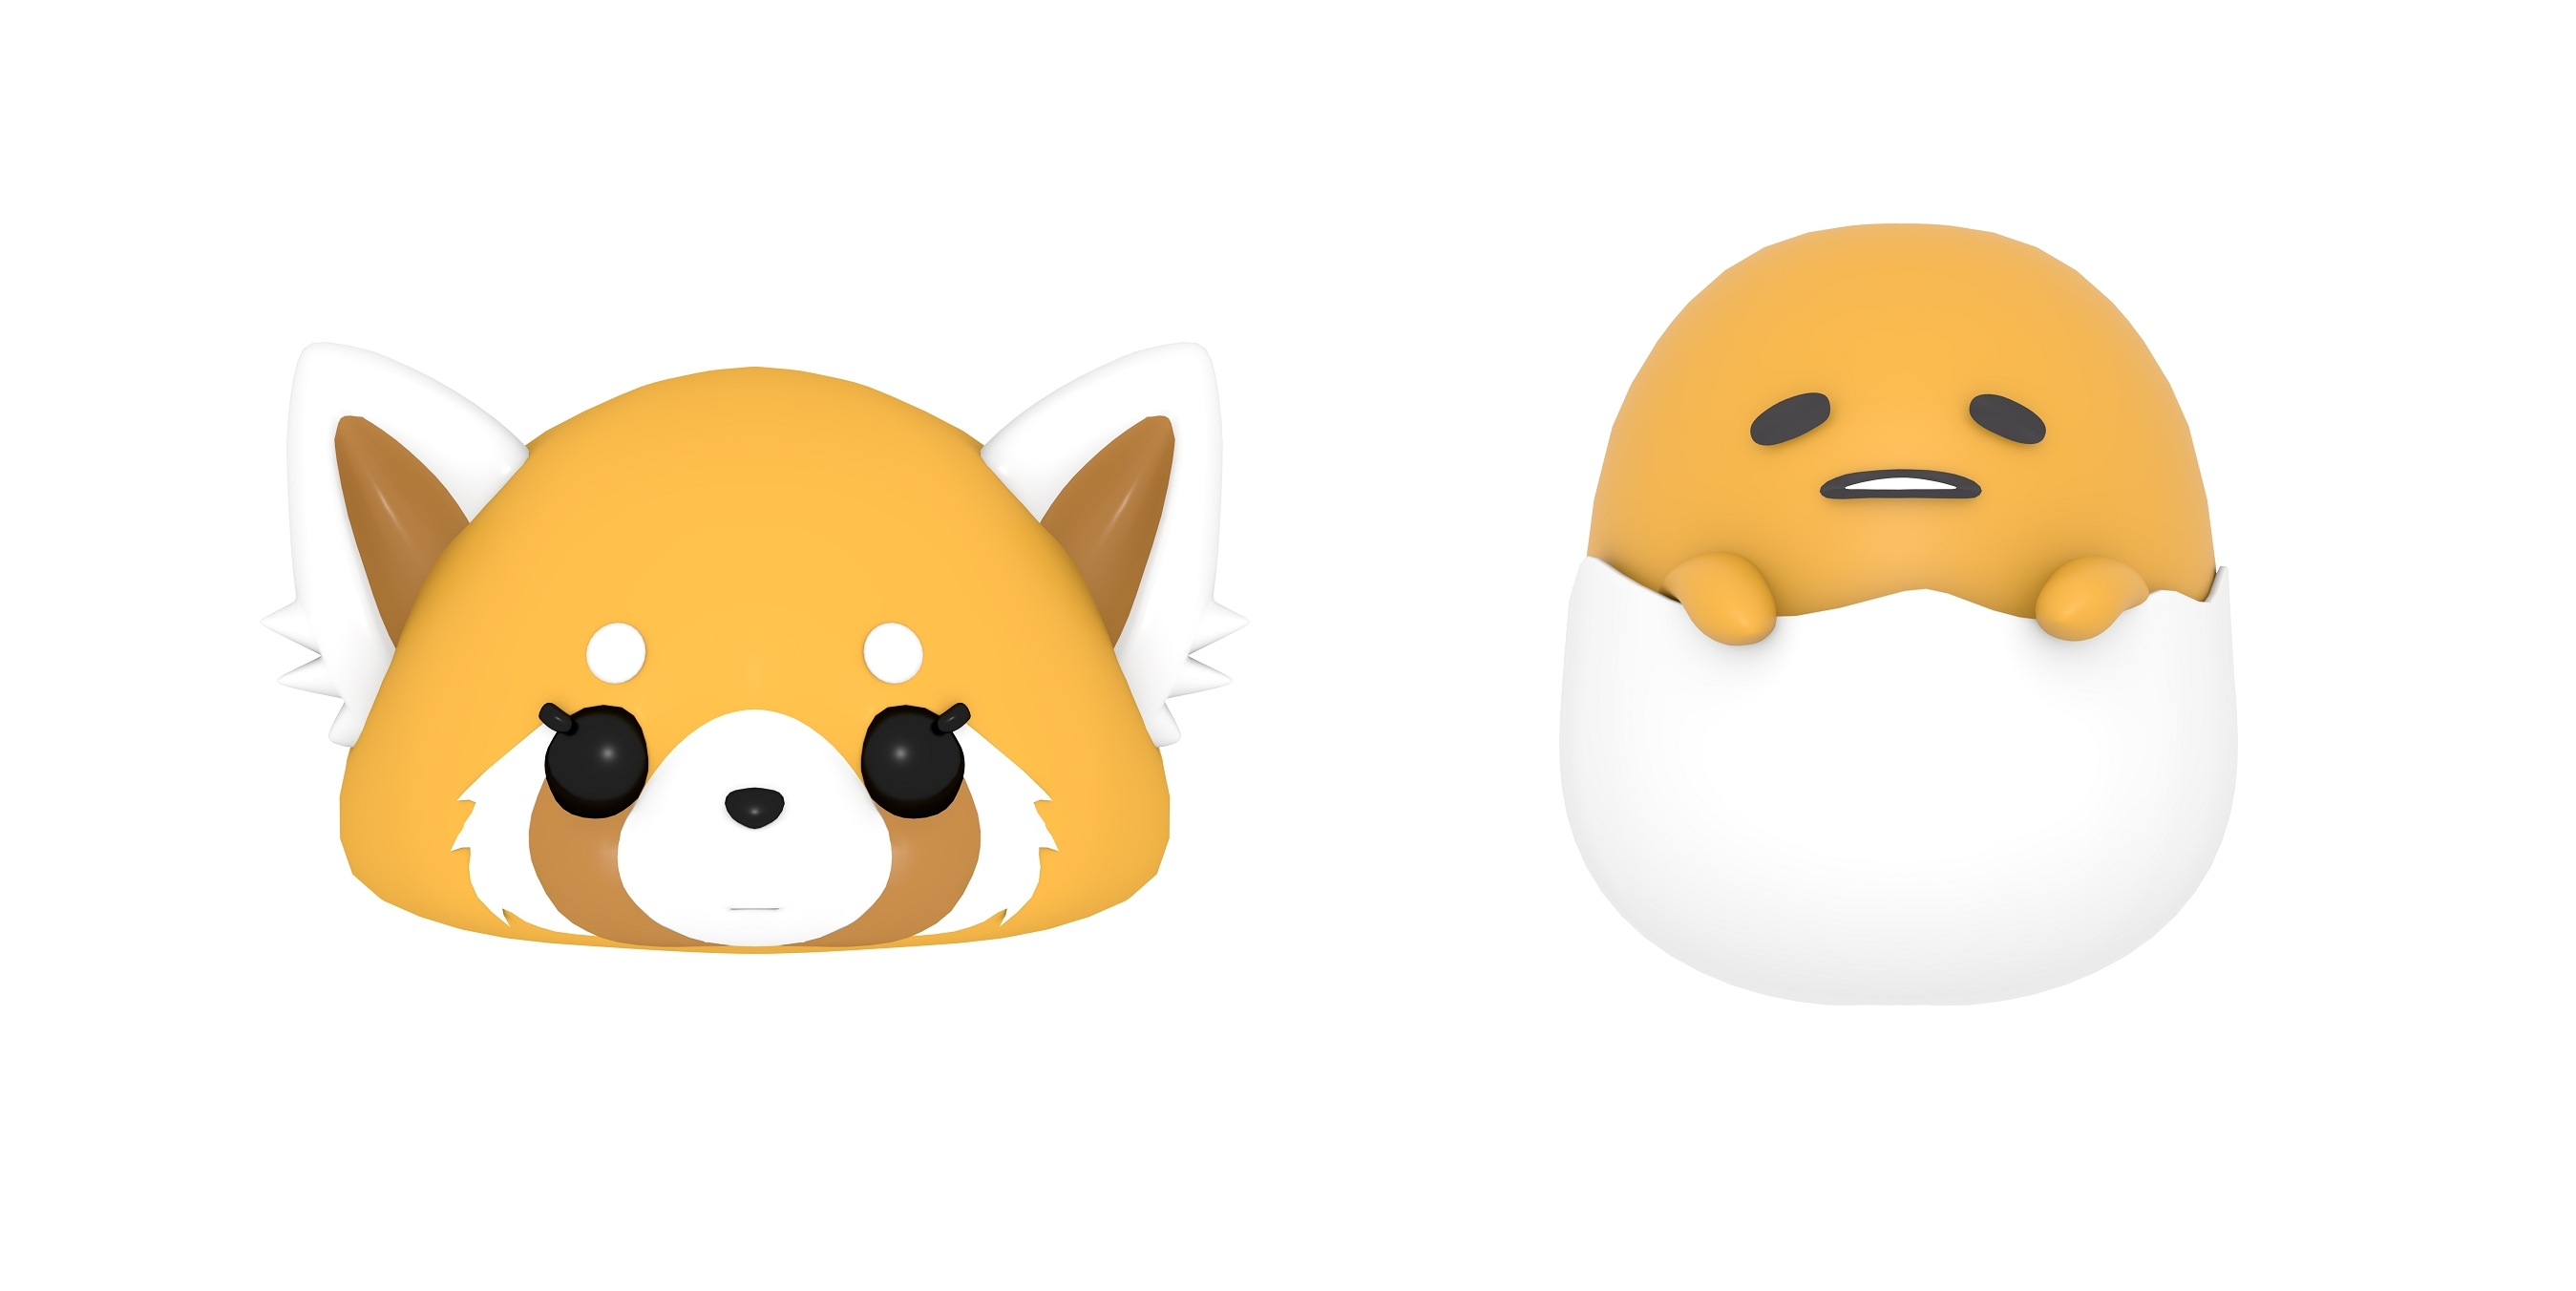 Baidu's Facemoji Keyboard Brings Sanrio Anime Characters to